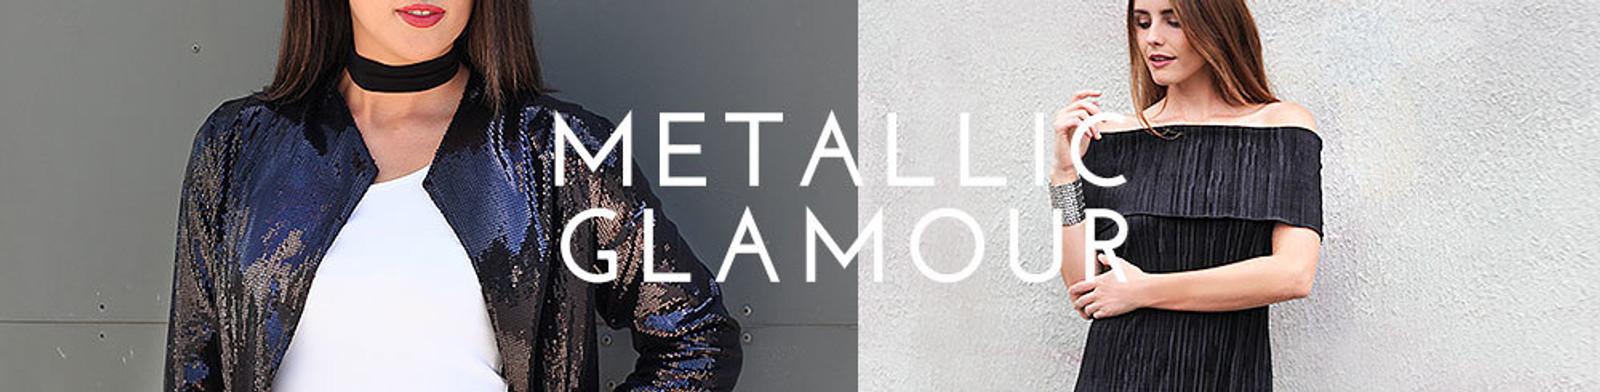 Metallic Glamour